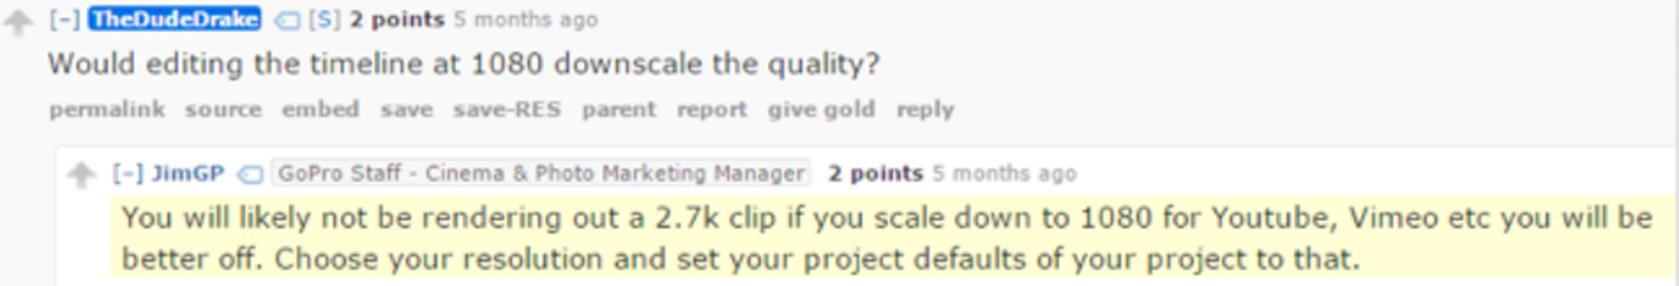 Reddit question post